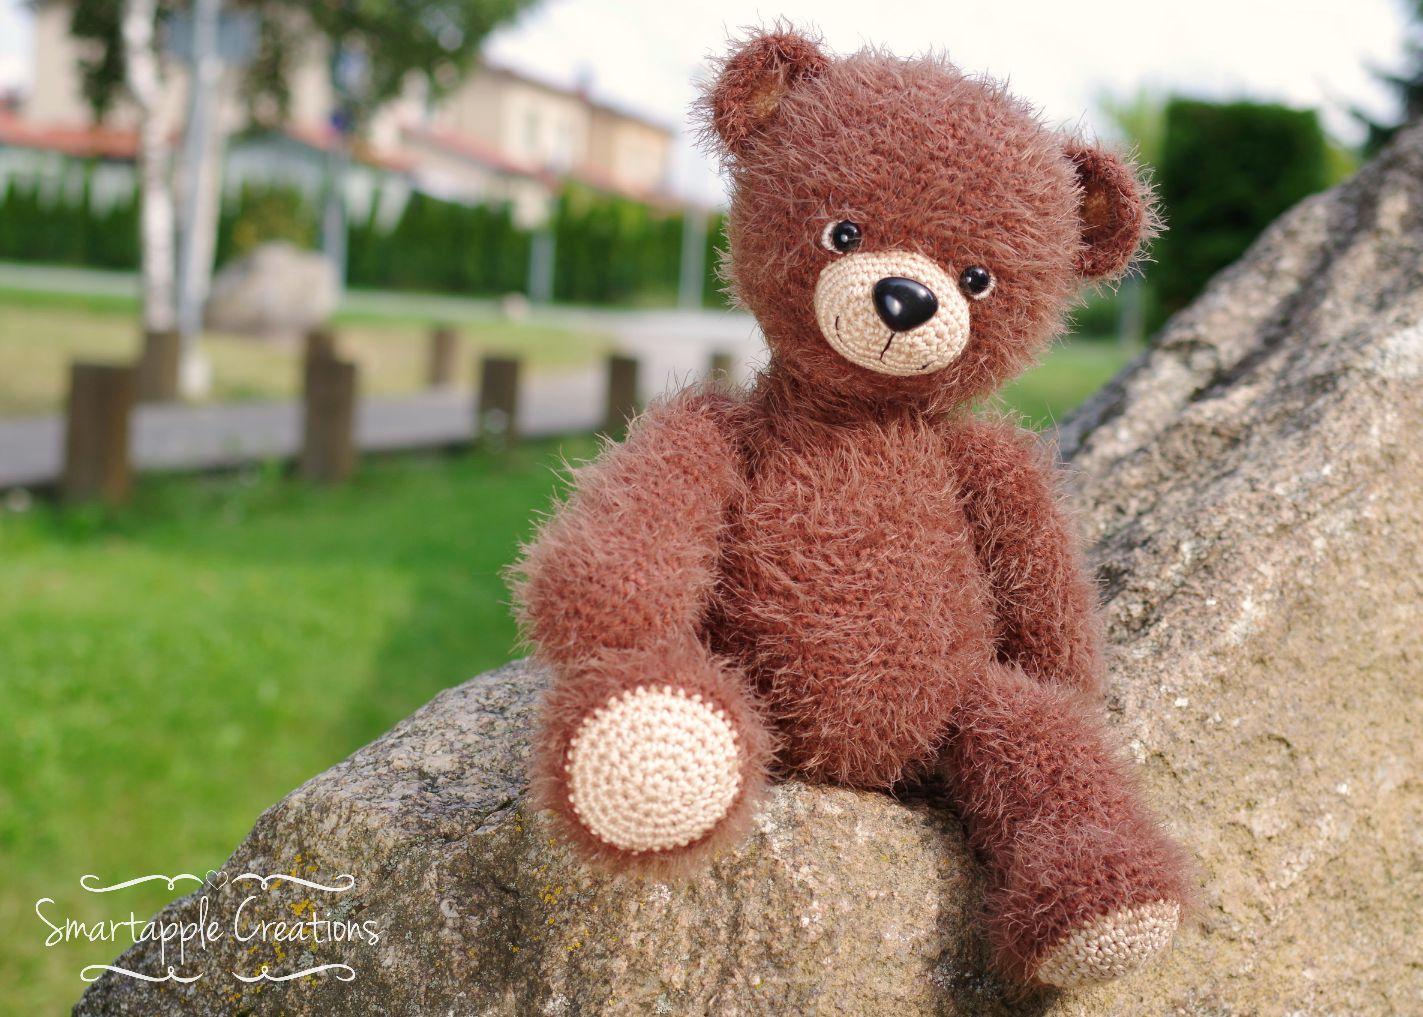 Smartapple Creations - amigurumi and crochet: Cuddly teddy ...